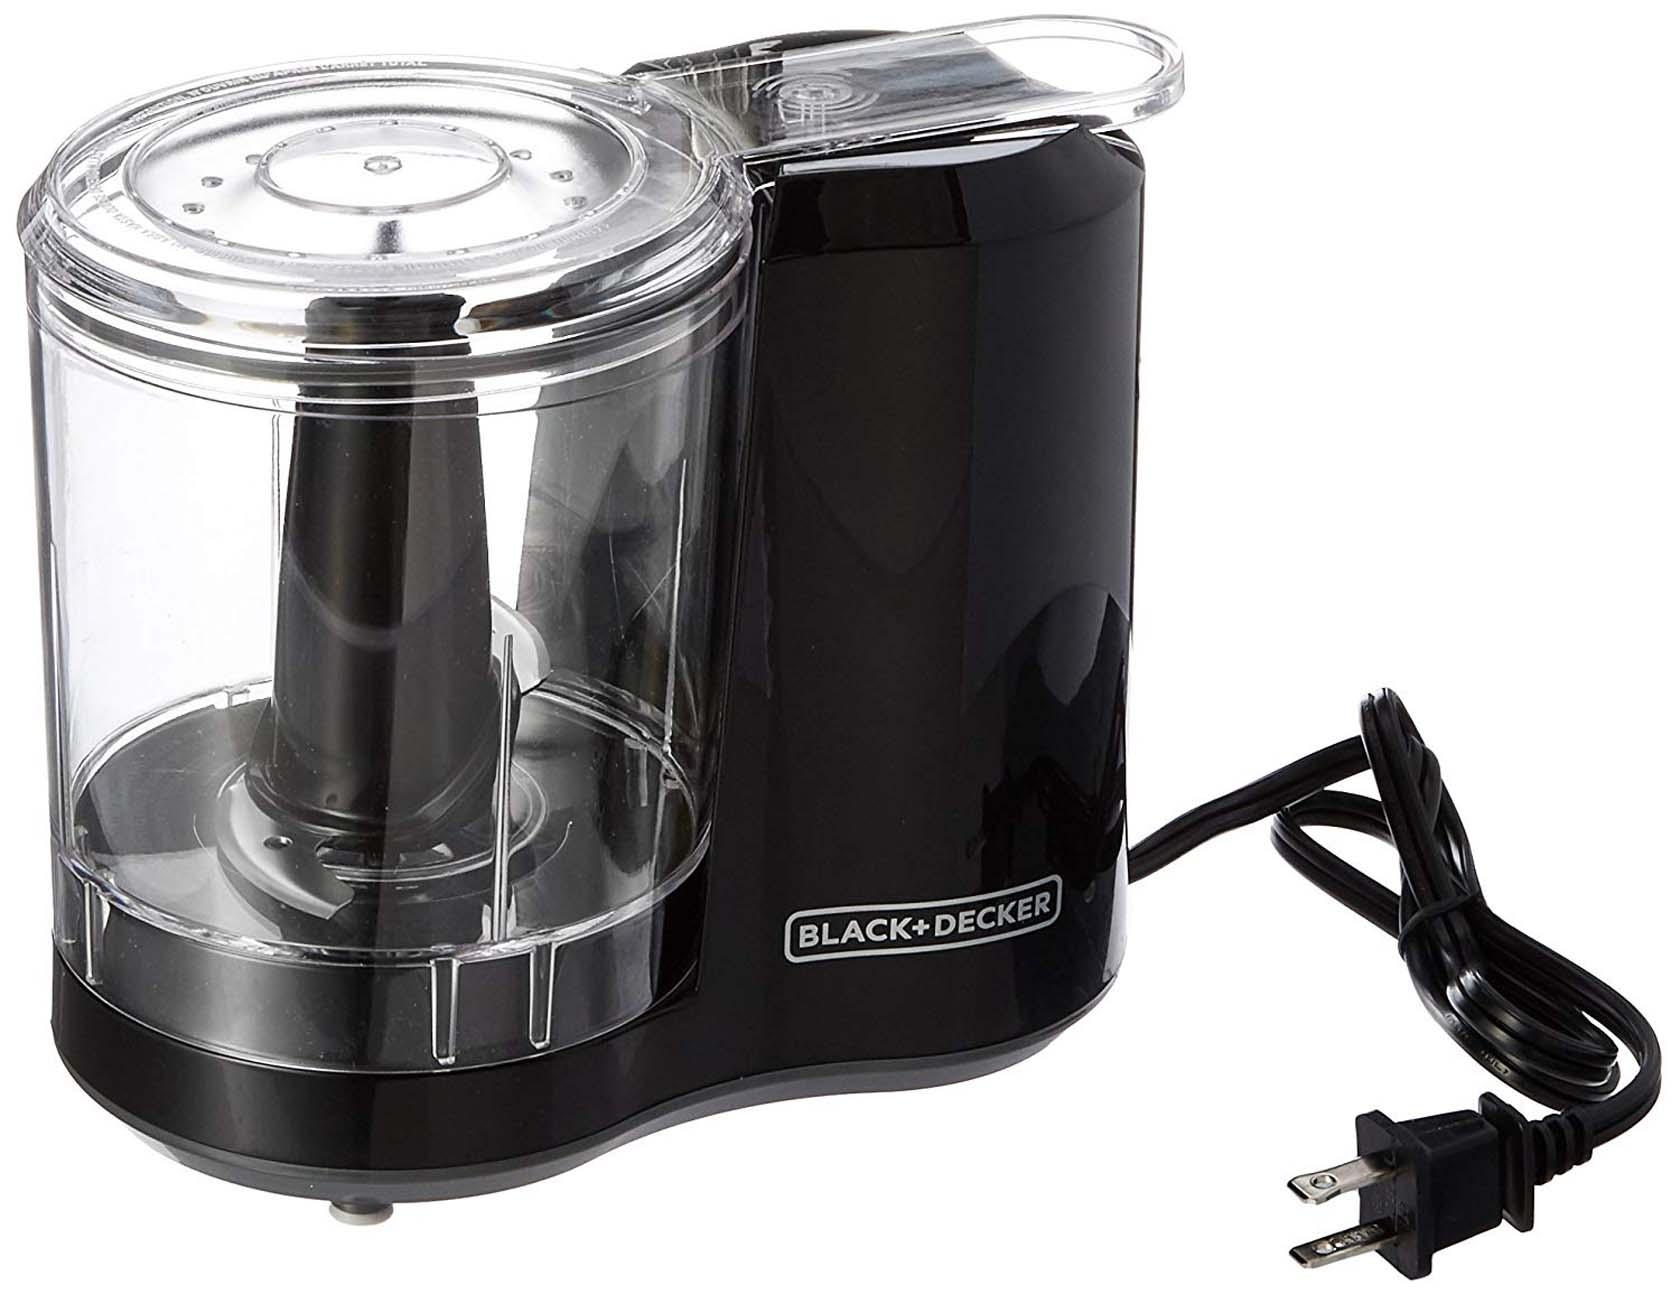 Black + Decker 3-Cup Electric Food Chopper